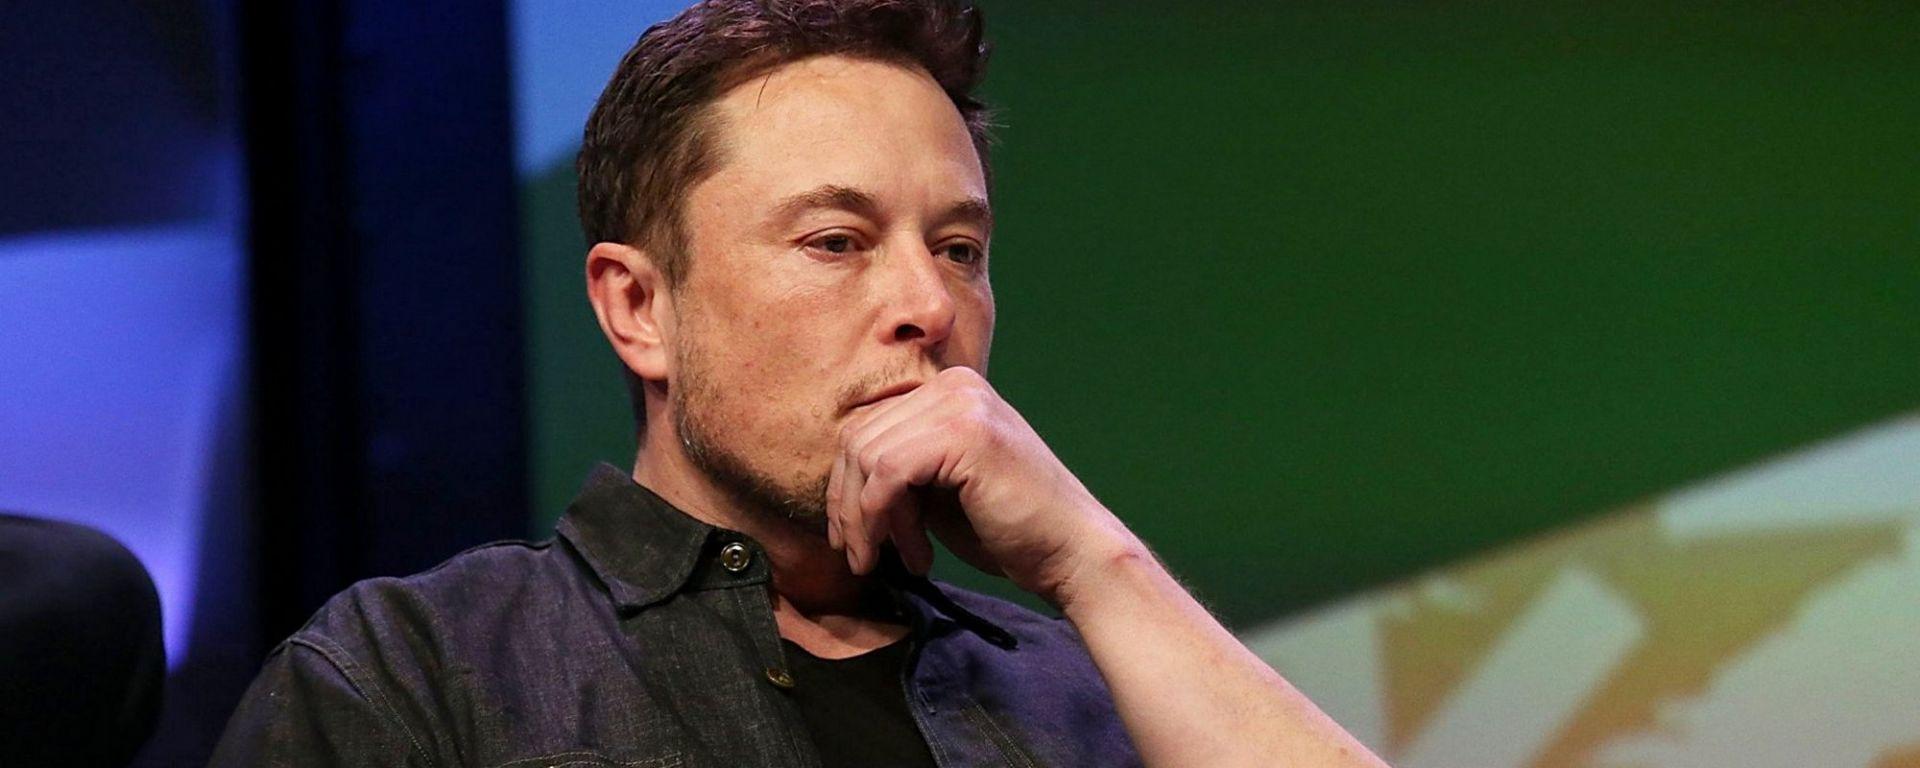 Elon Musk, Ceo di Tesla, sospetta di un sabotatore interno